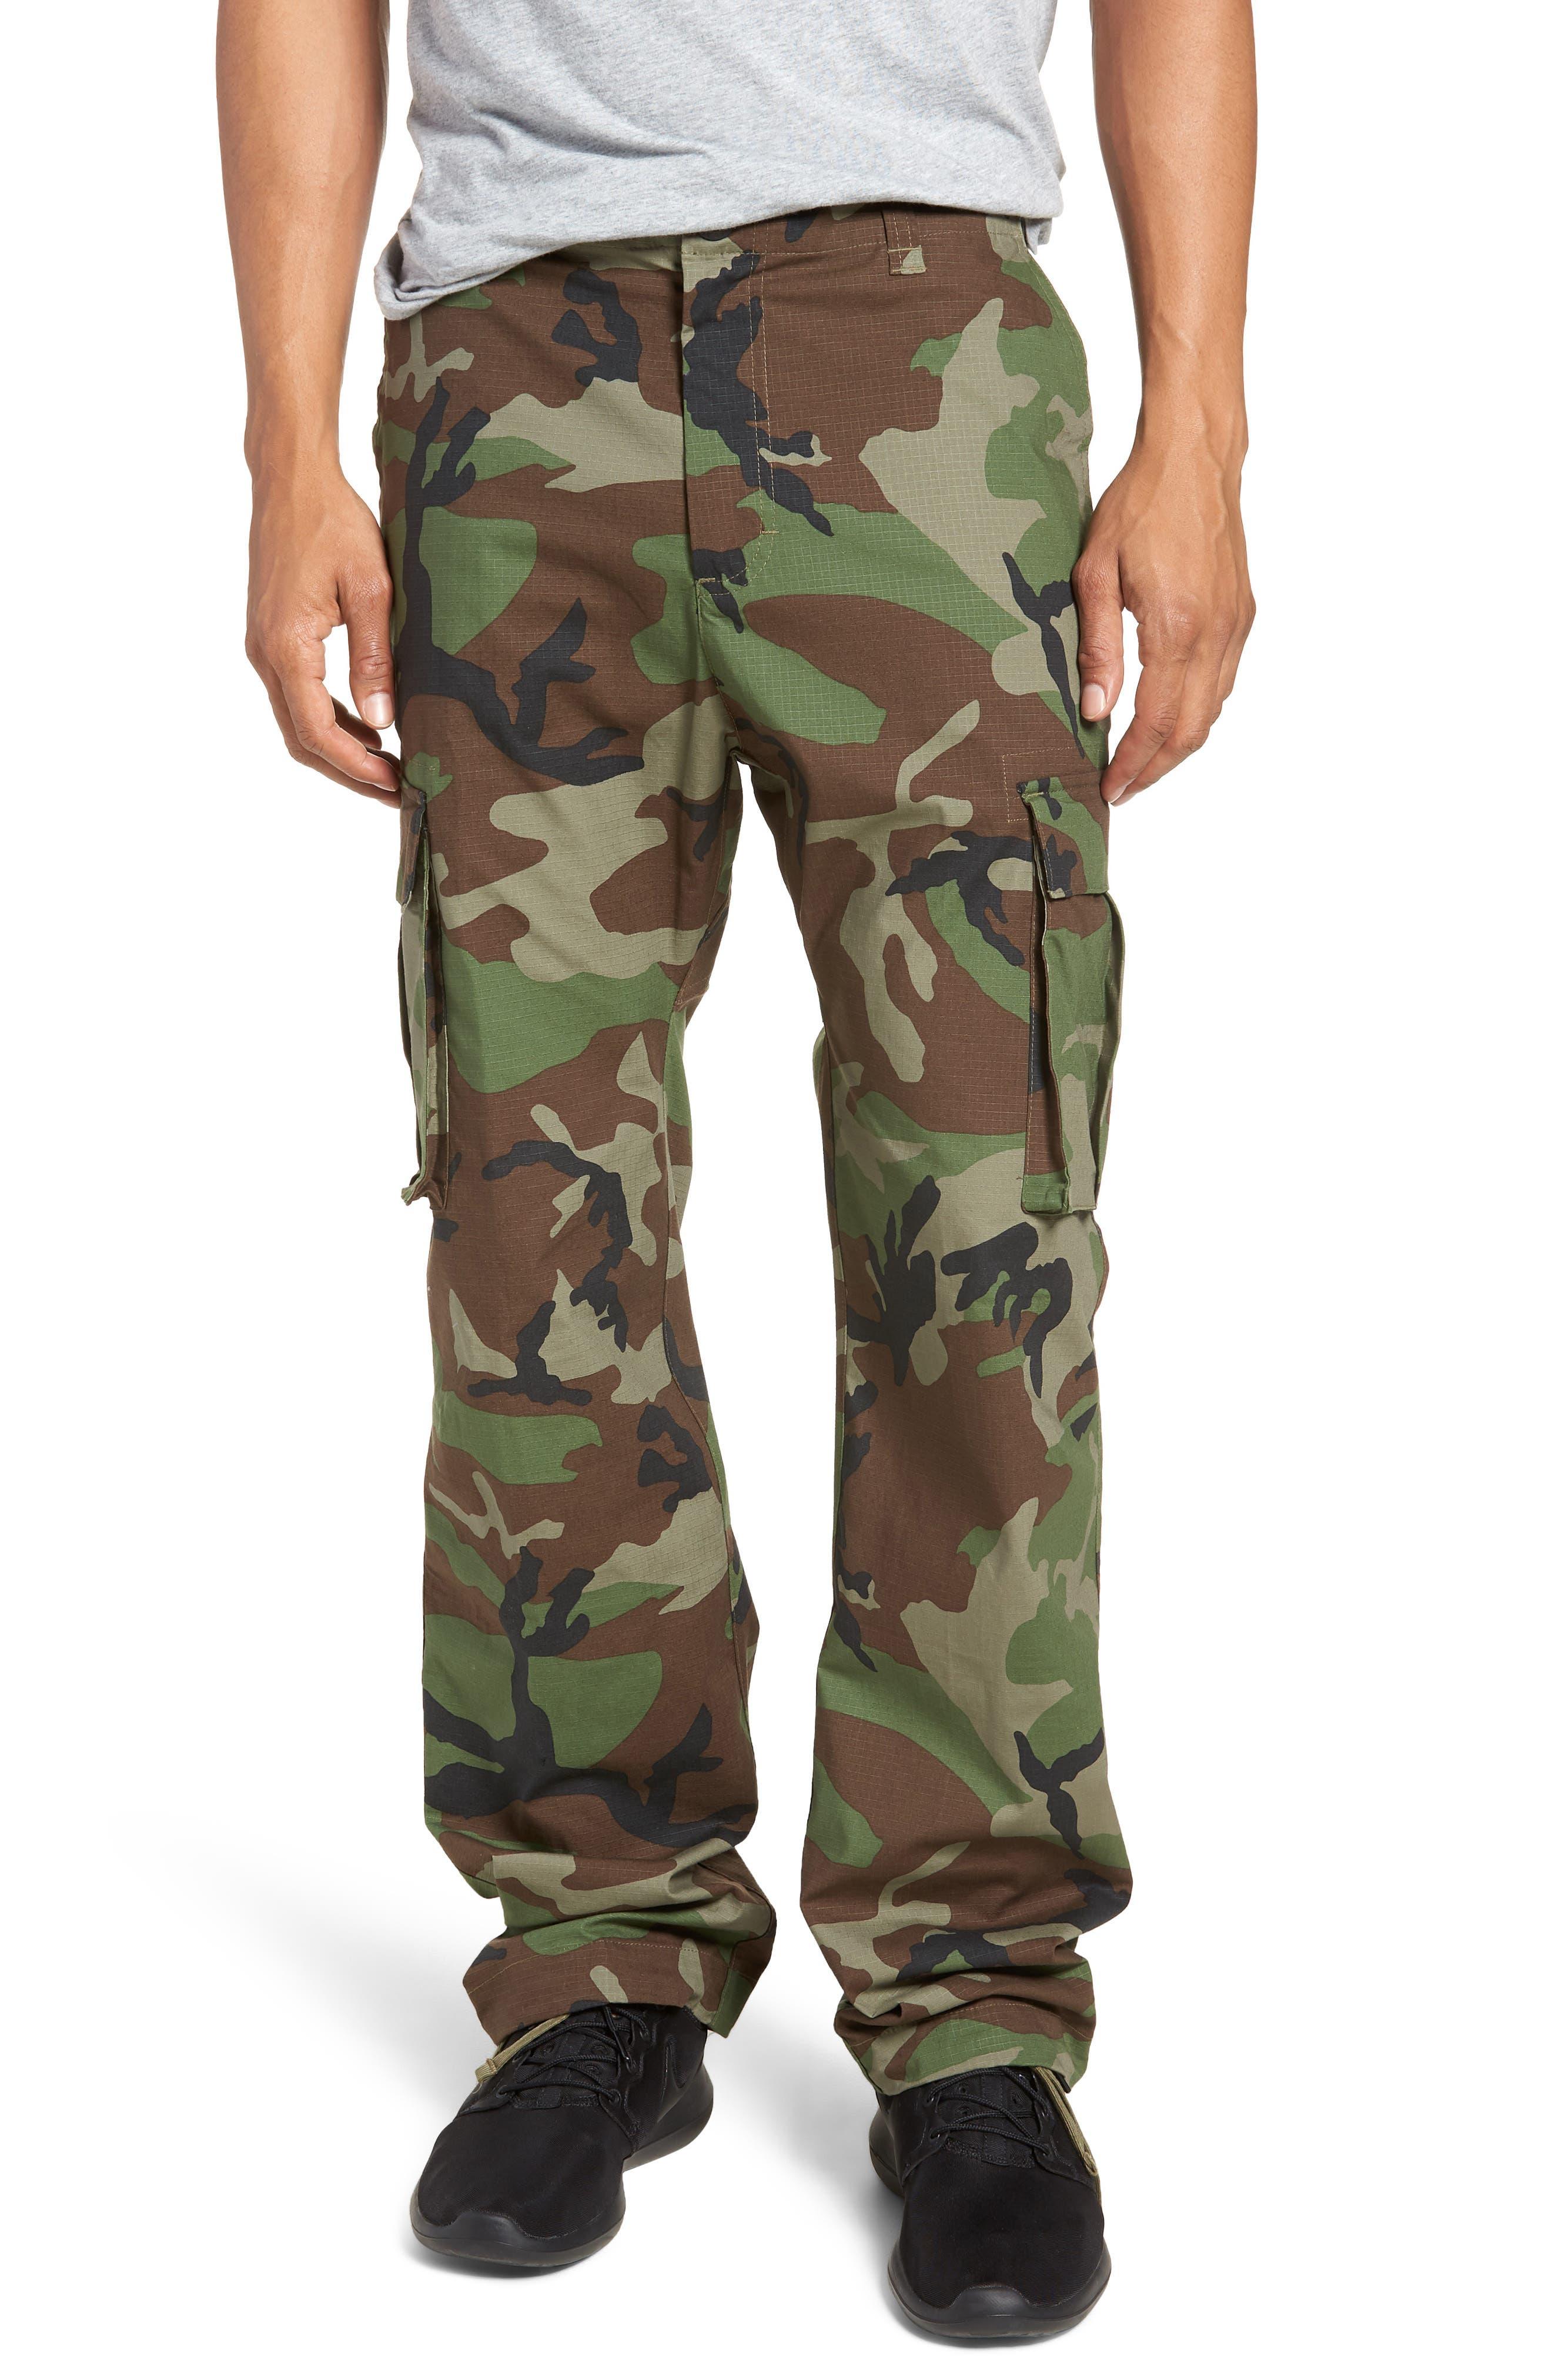 Nike Sb Flex Cargo Pants, Green